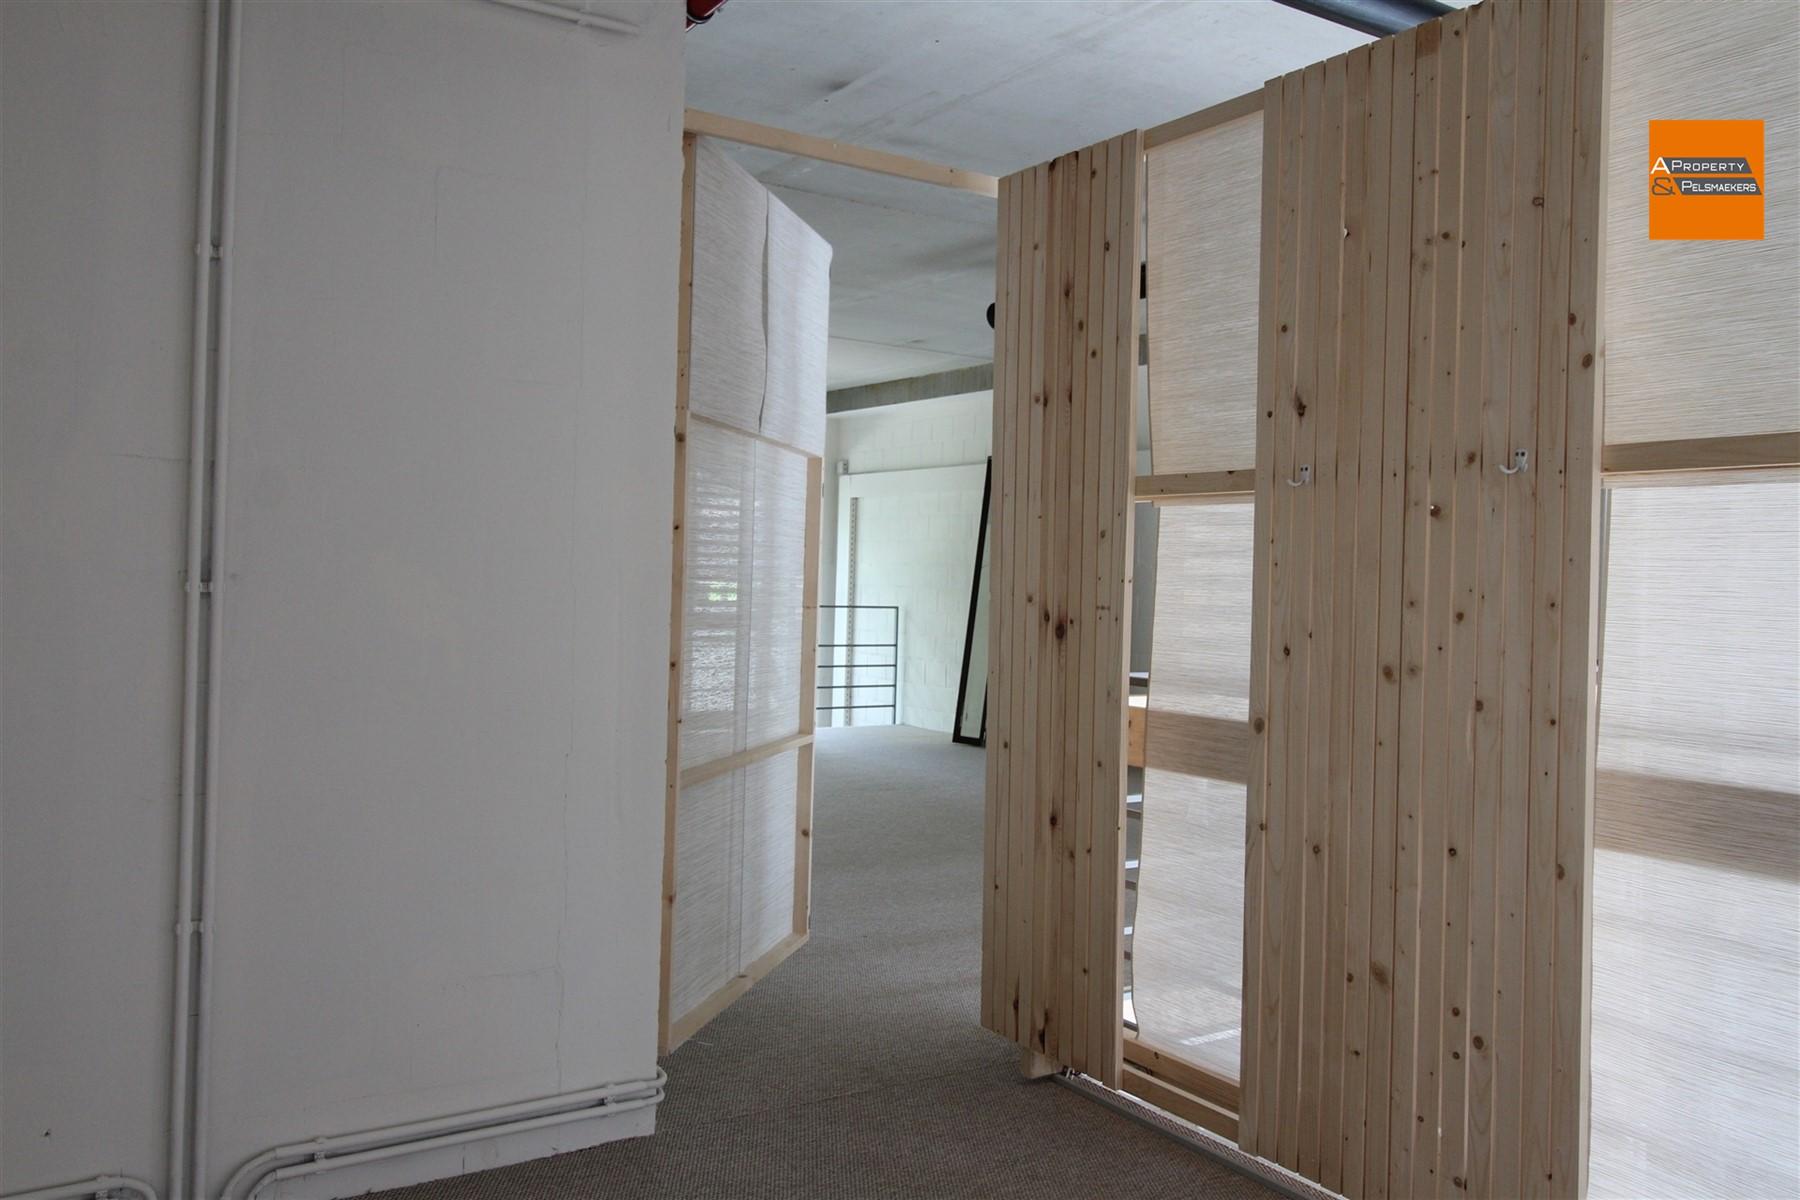 Foto 7 : Winkelruimte in 3010 KESSEL LO (België) - Prijs € 1.750